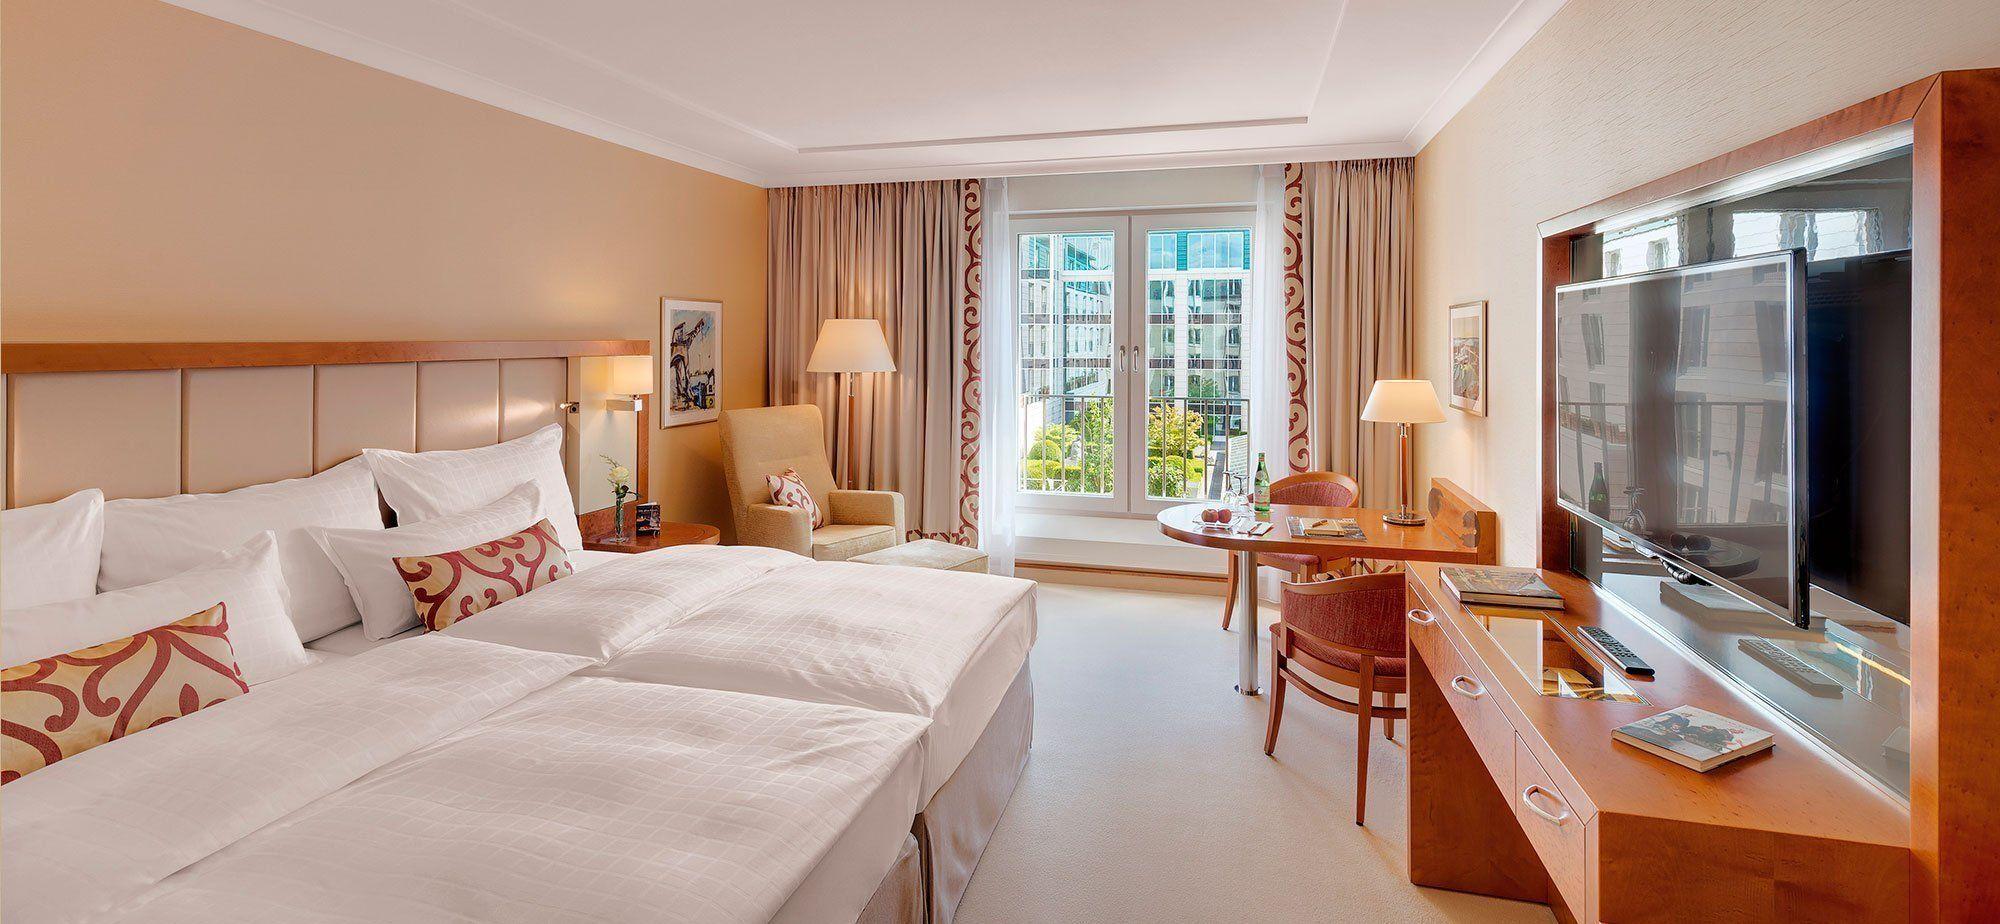 Gartenhof Zimmer Im Grand Elysee Hotel Hamburg